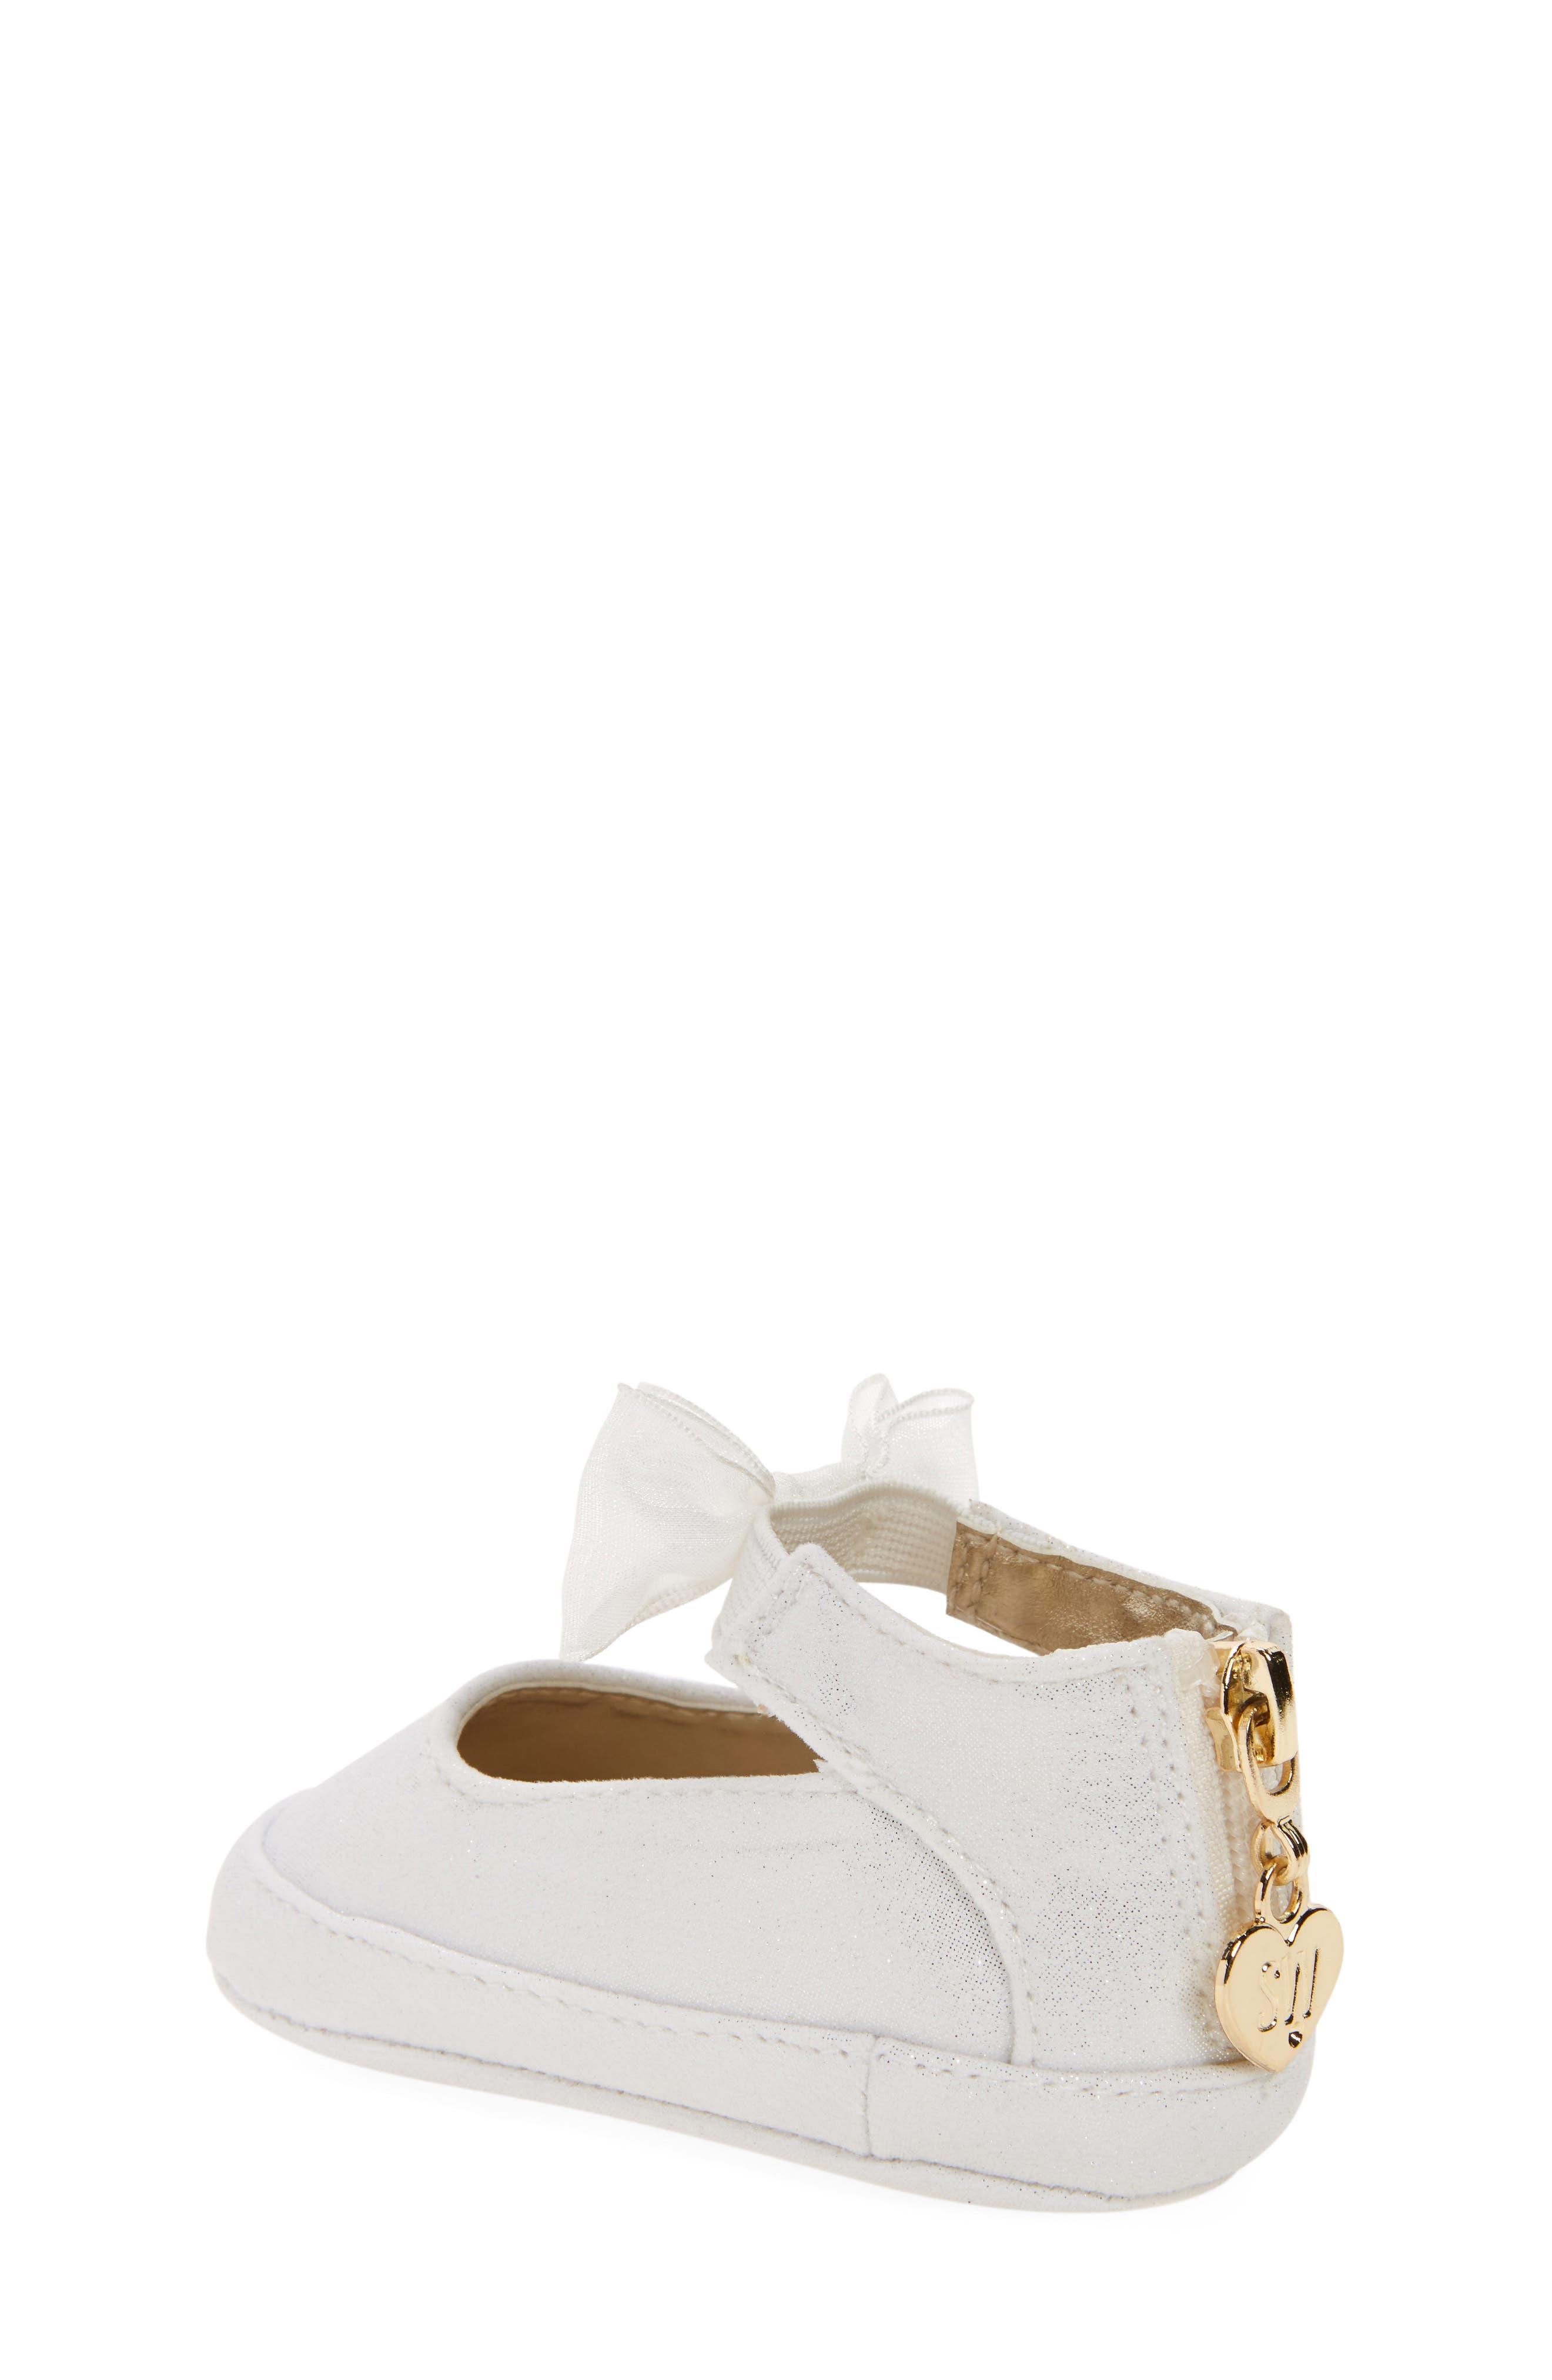 Baby Nantucket Crib Shoe,                             Alternate thumbnail 2, color,                             100